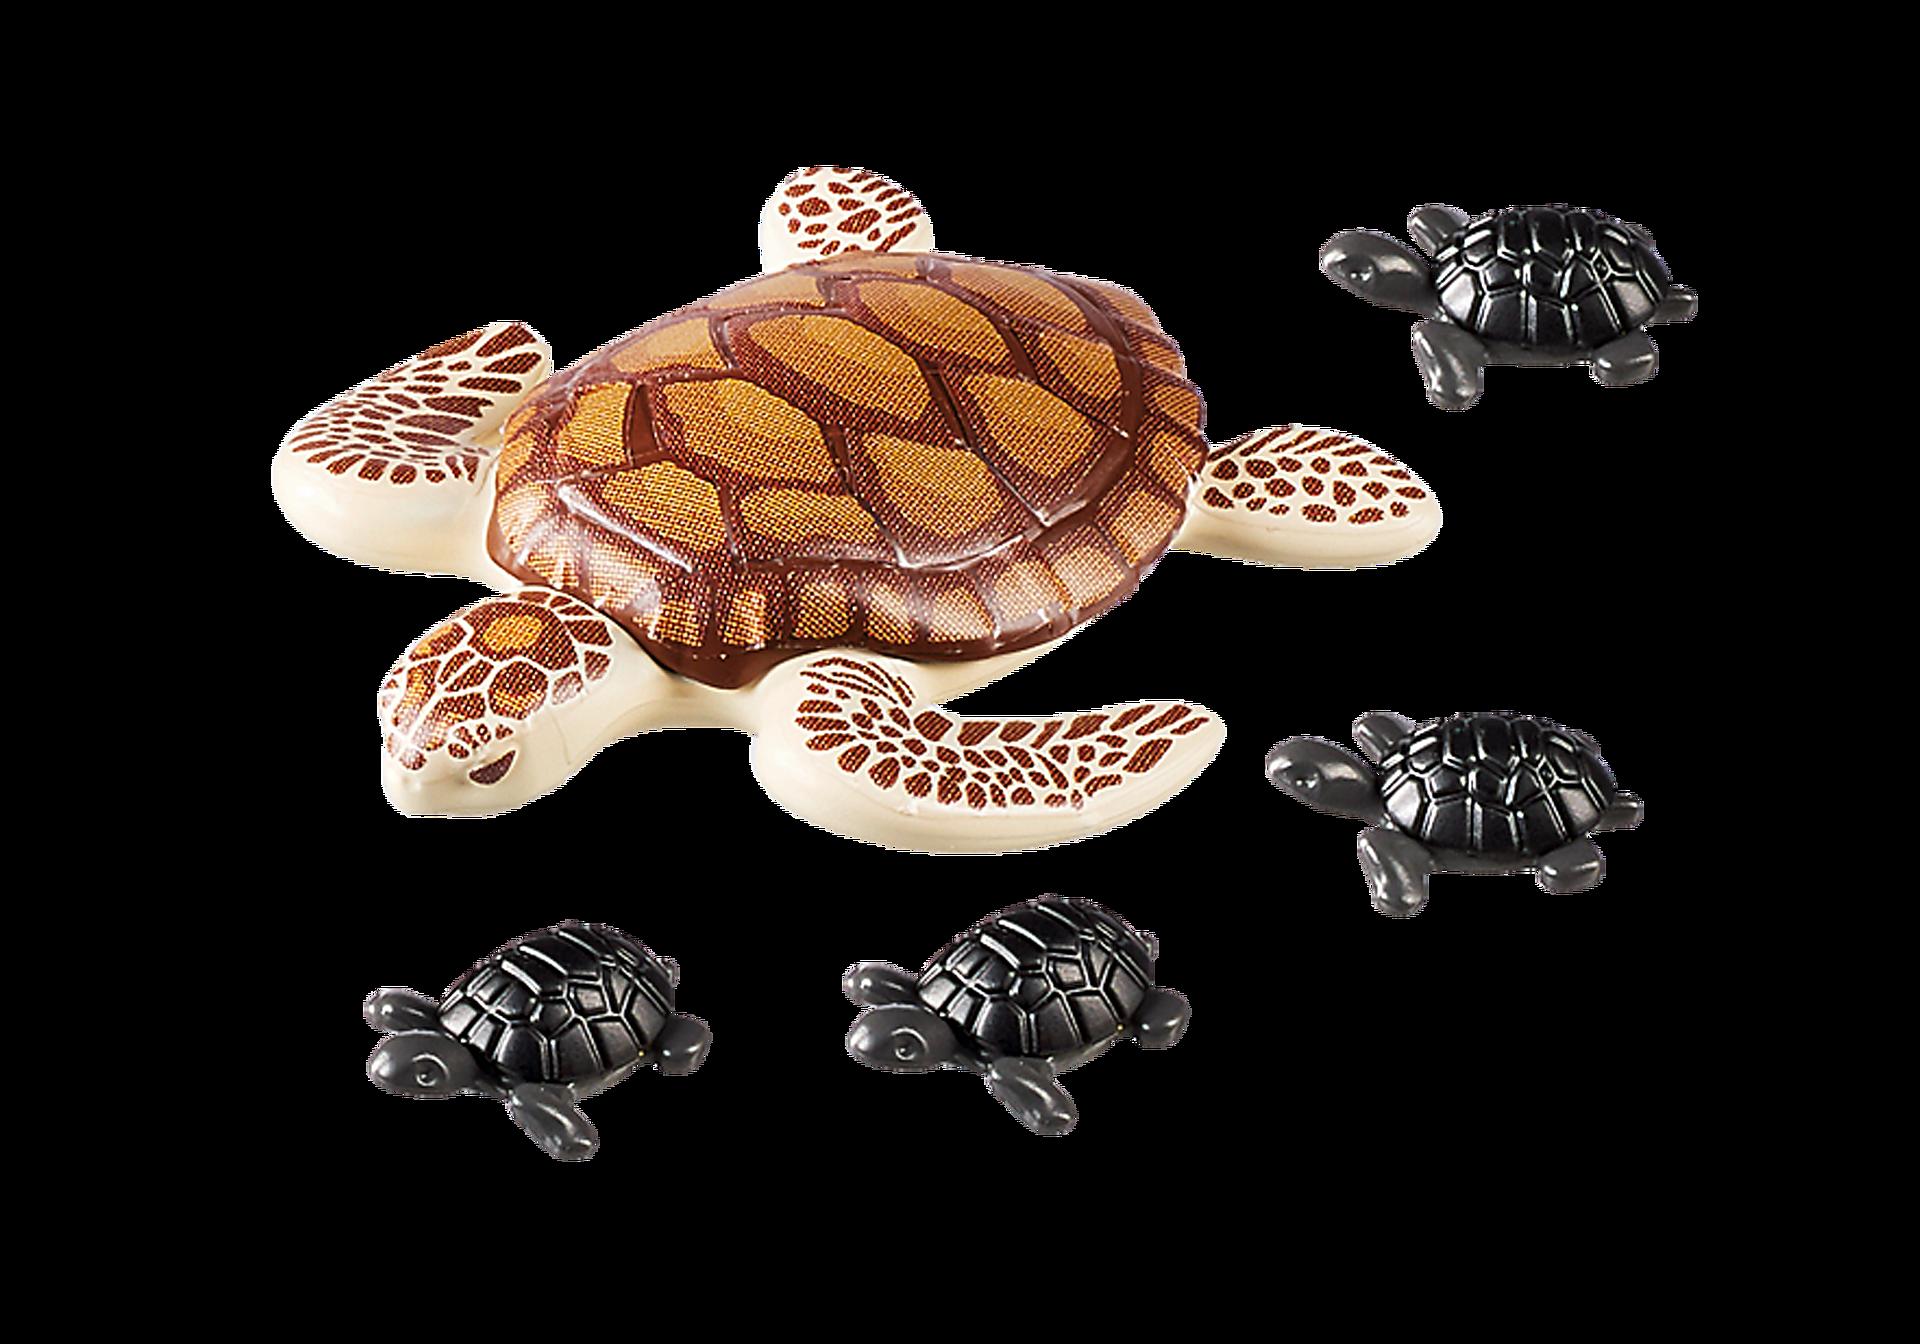 9071 Sea Turtle with Babies zoom image4